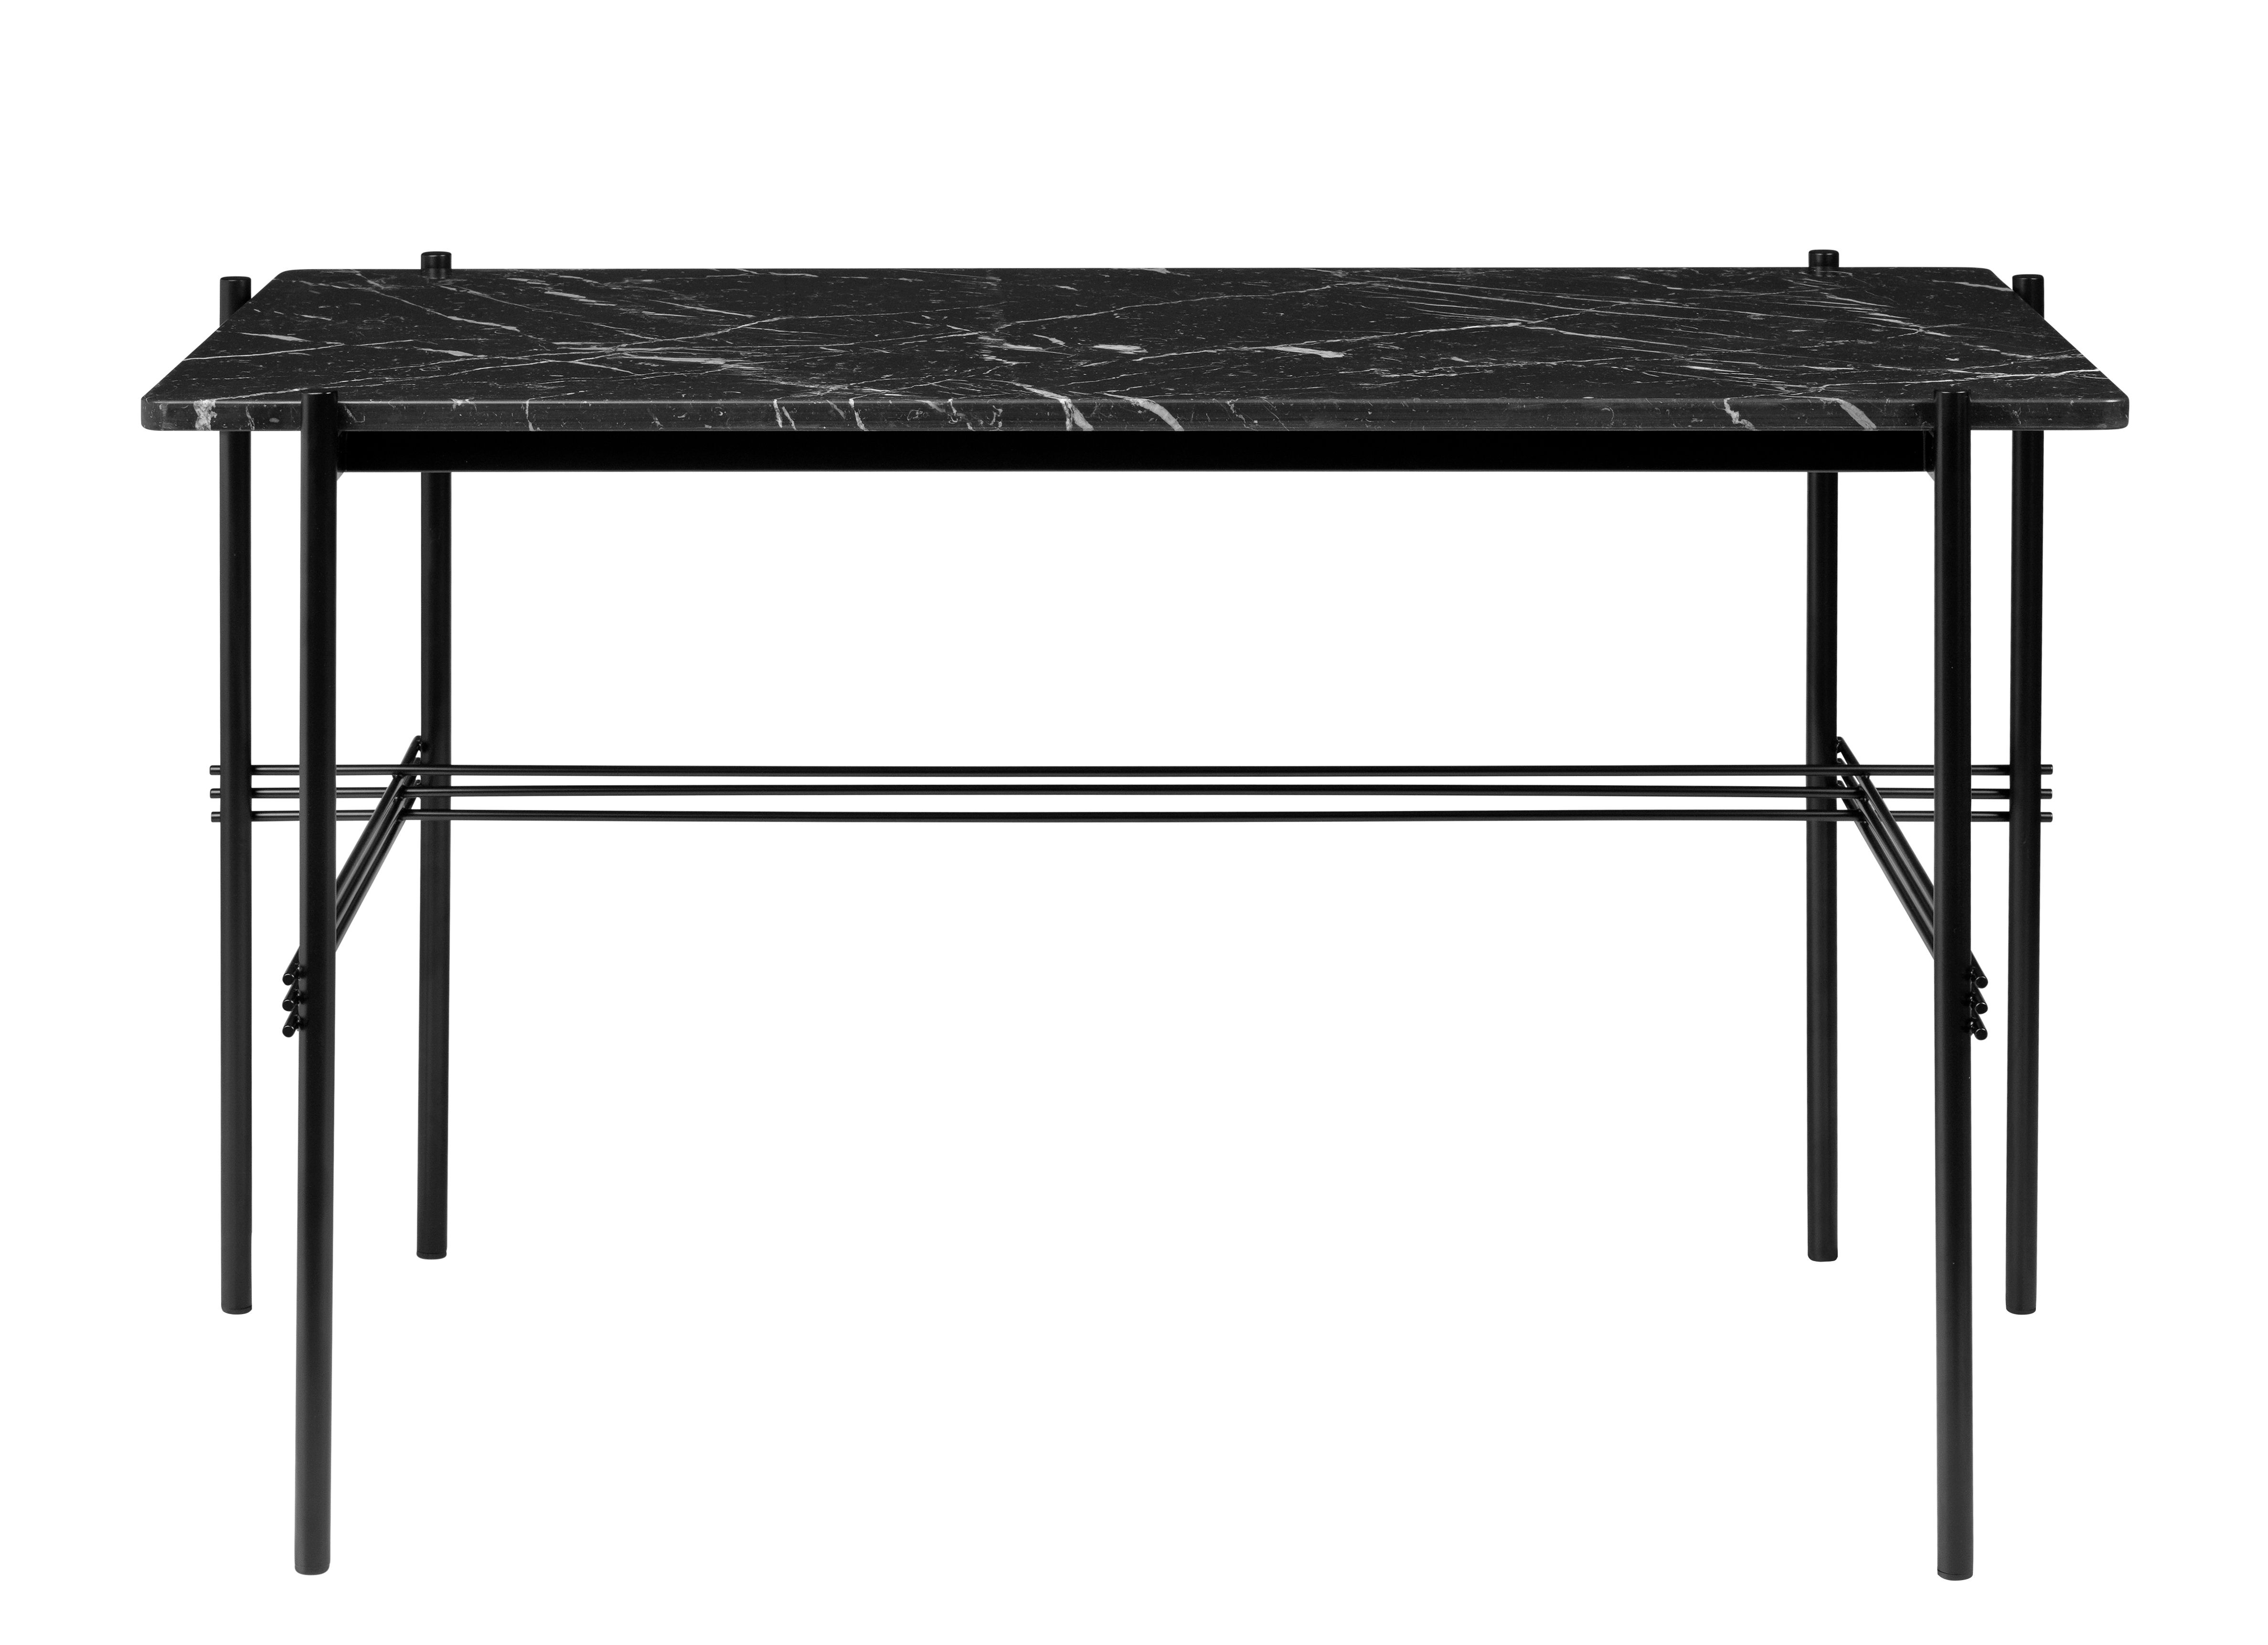 bureau ts marbre gamfratesi l 120 cm marbre noir. Black Bedroom Furniture Sets. Home Design Ideas